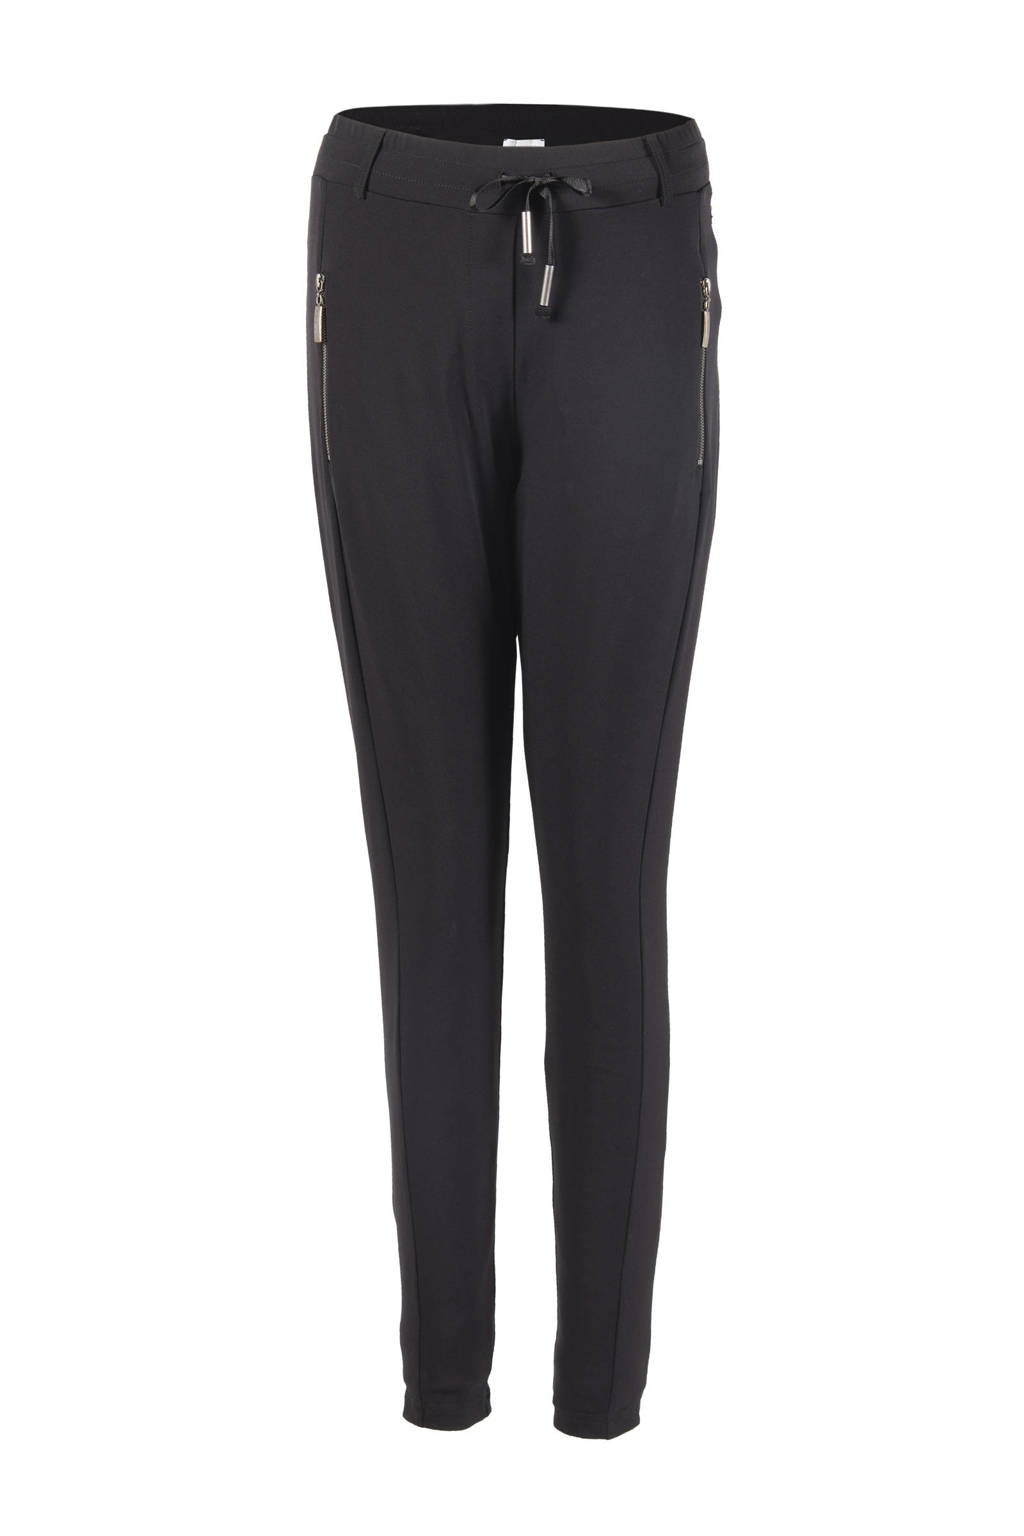 TQ-Amsterdam high waist tapered fit broek Maud van travelstof zwart, Zwart